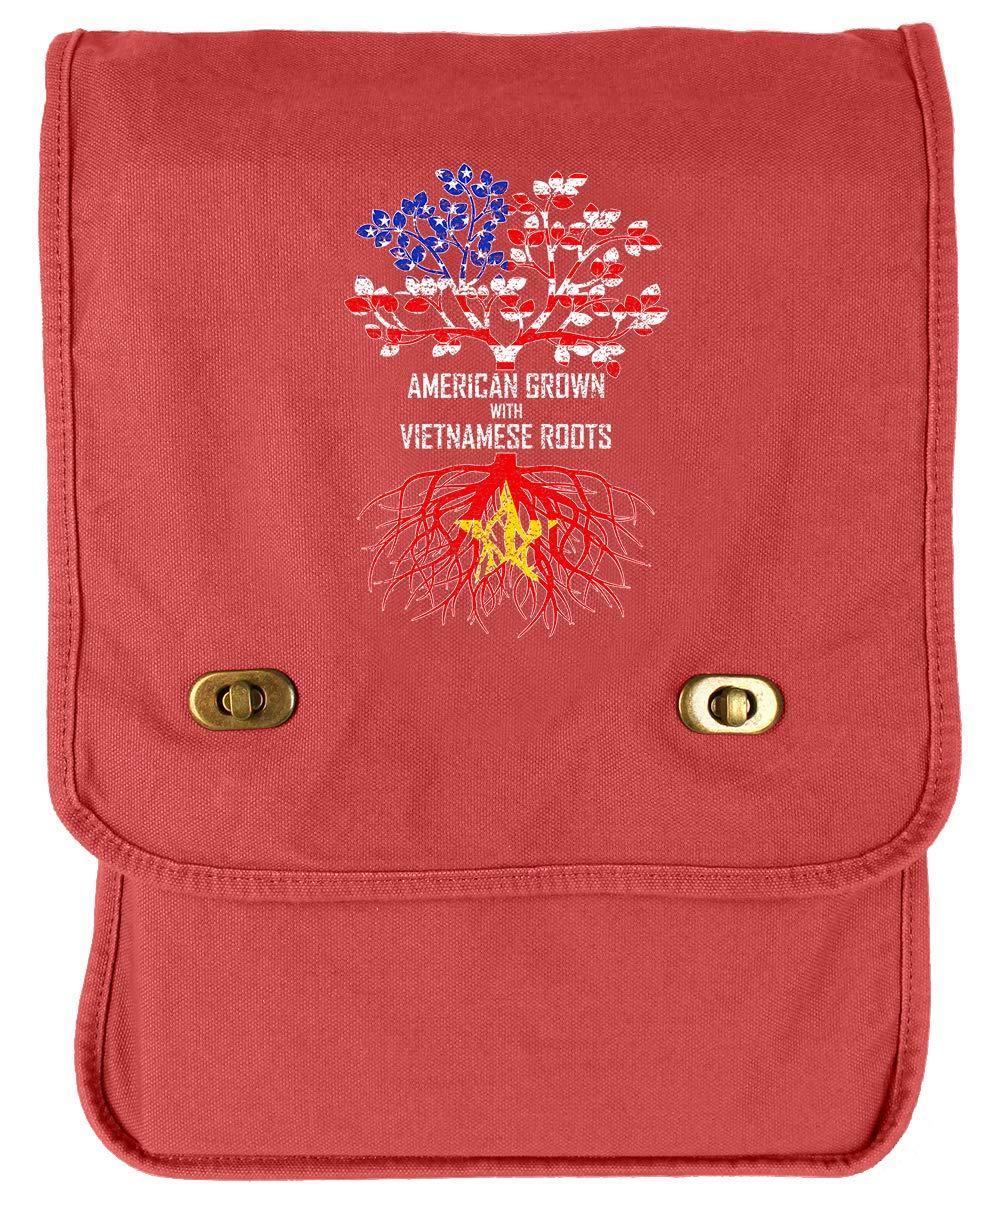 Tenacitee American Grown with Vietnamese Roots Navy Brushed Canvas Messenger Bag